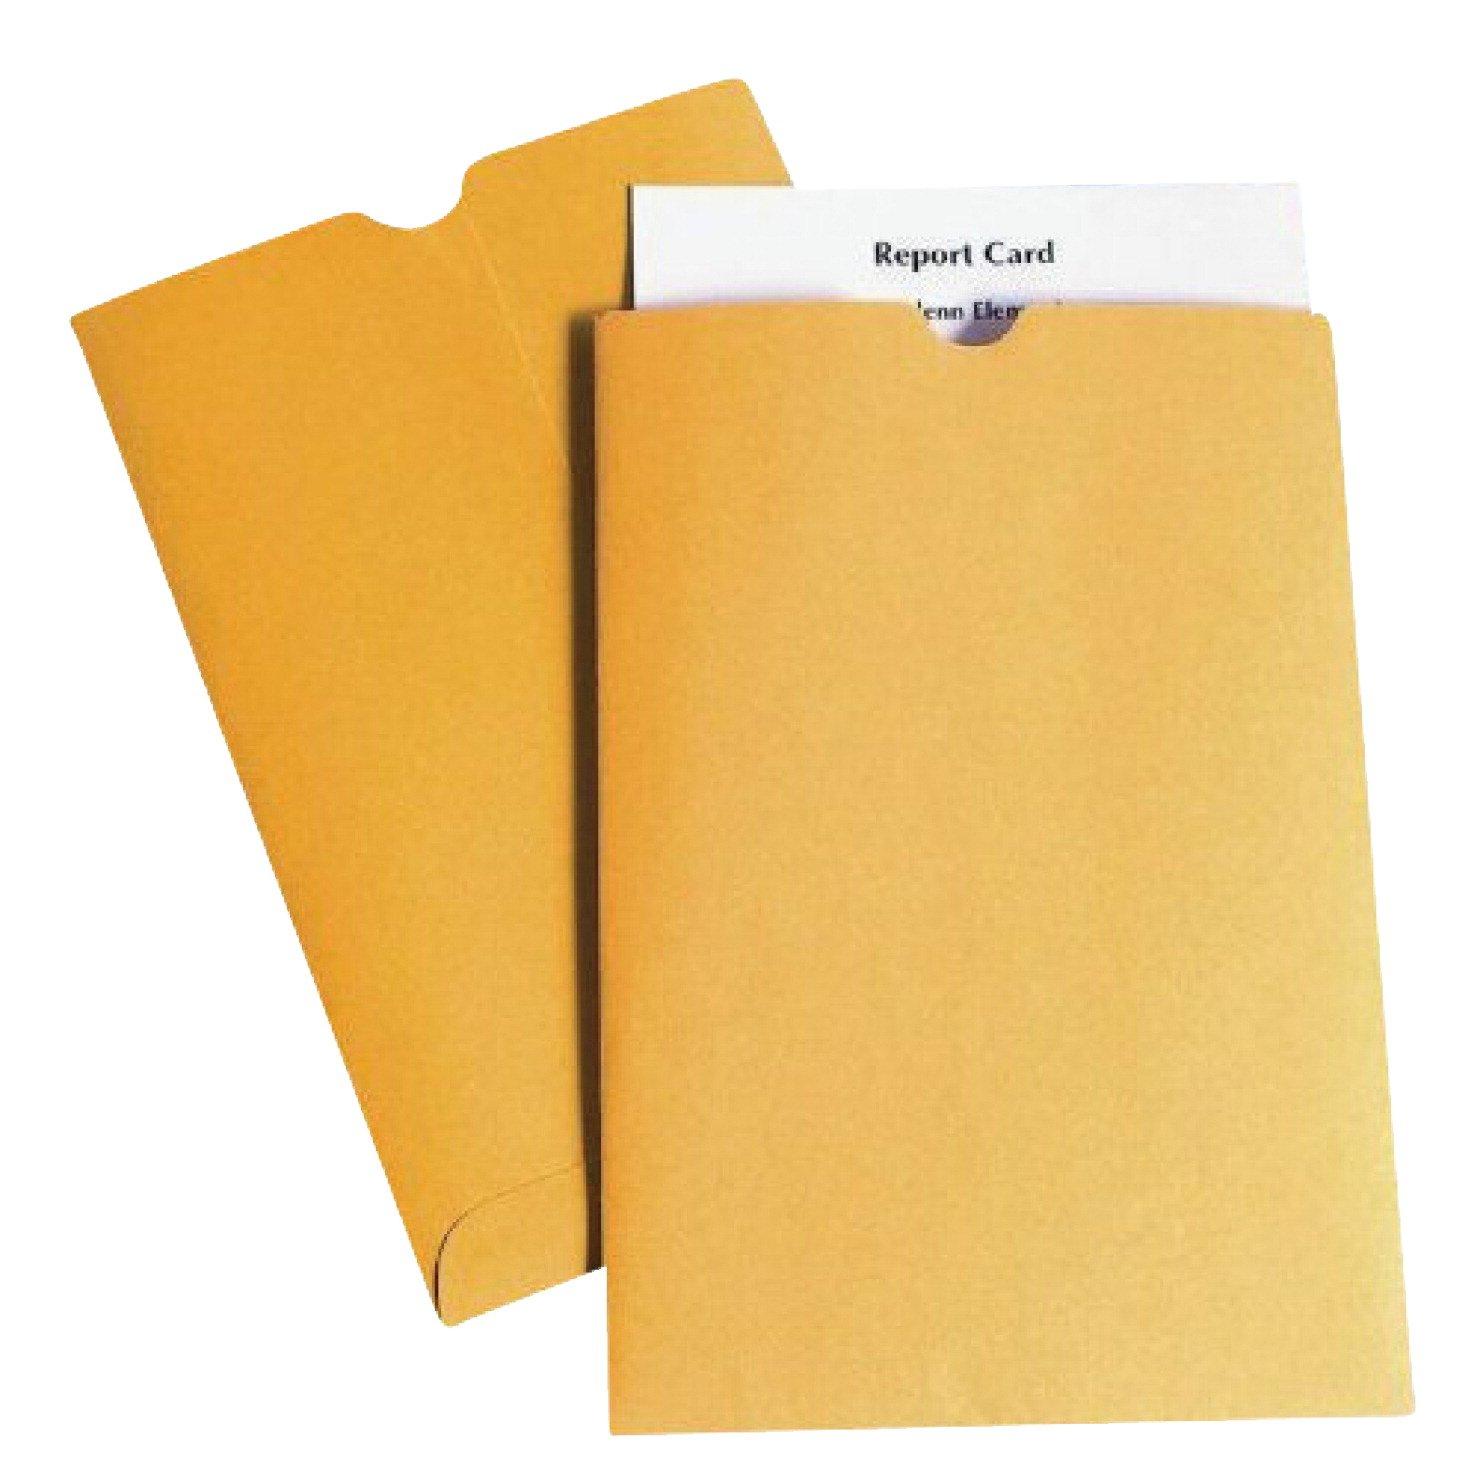 School Smart Report Card Envelope, 28 lb, 6 x 9 Inch, Kraft, Pack of 500